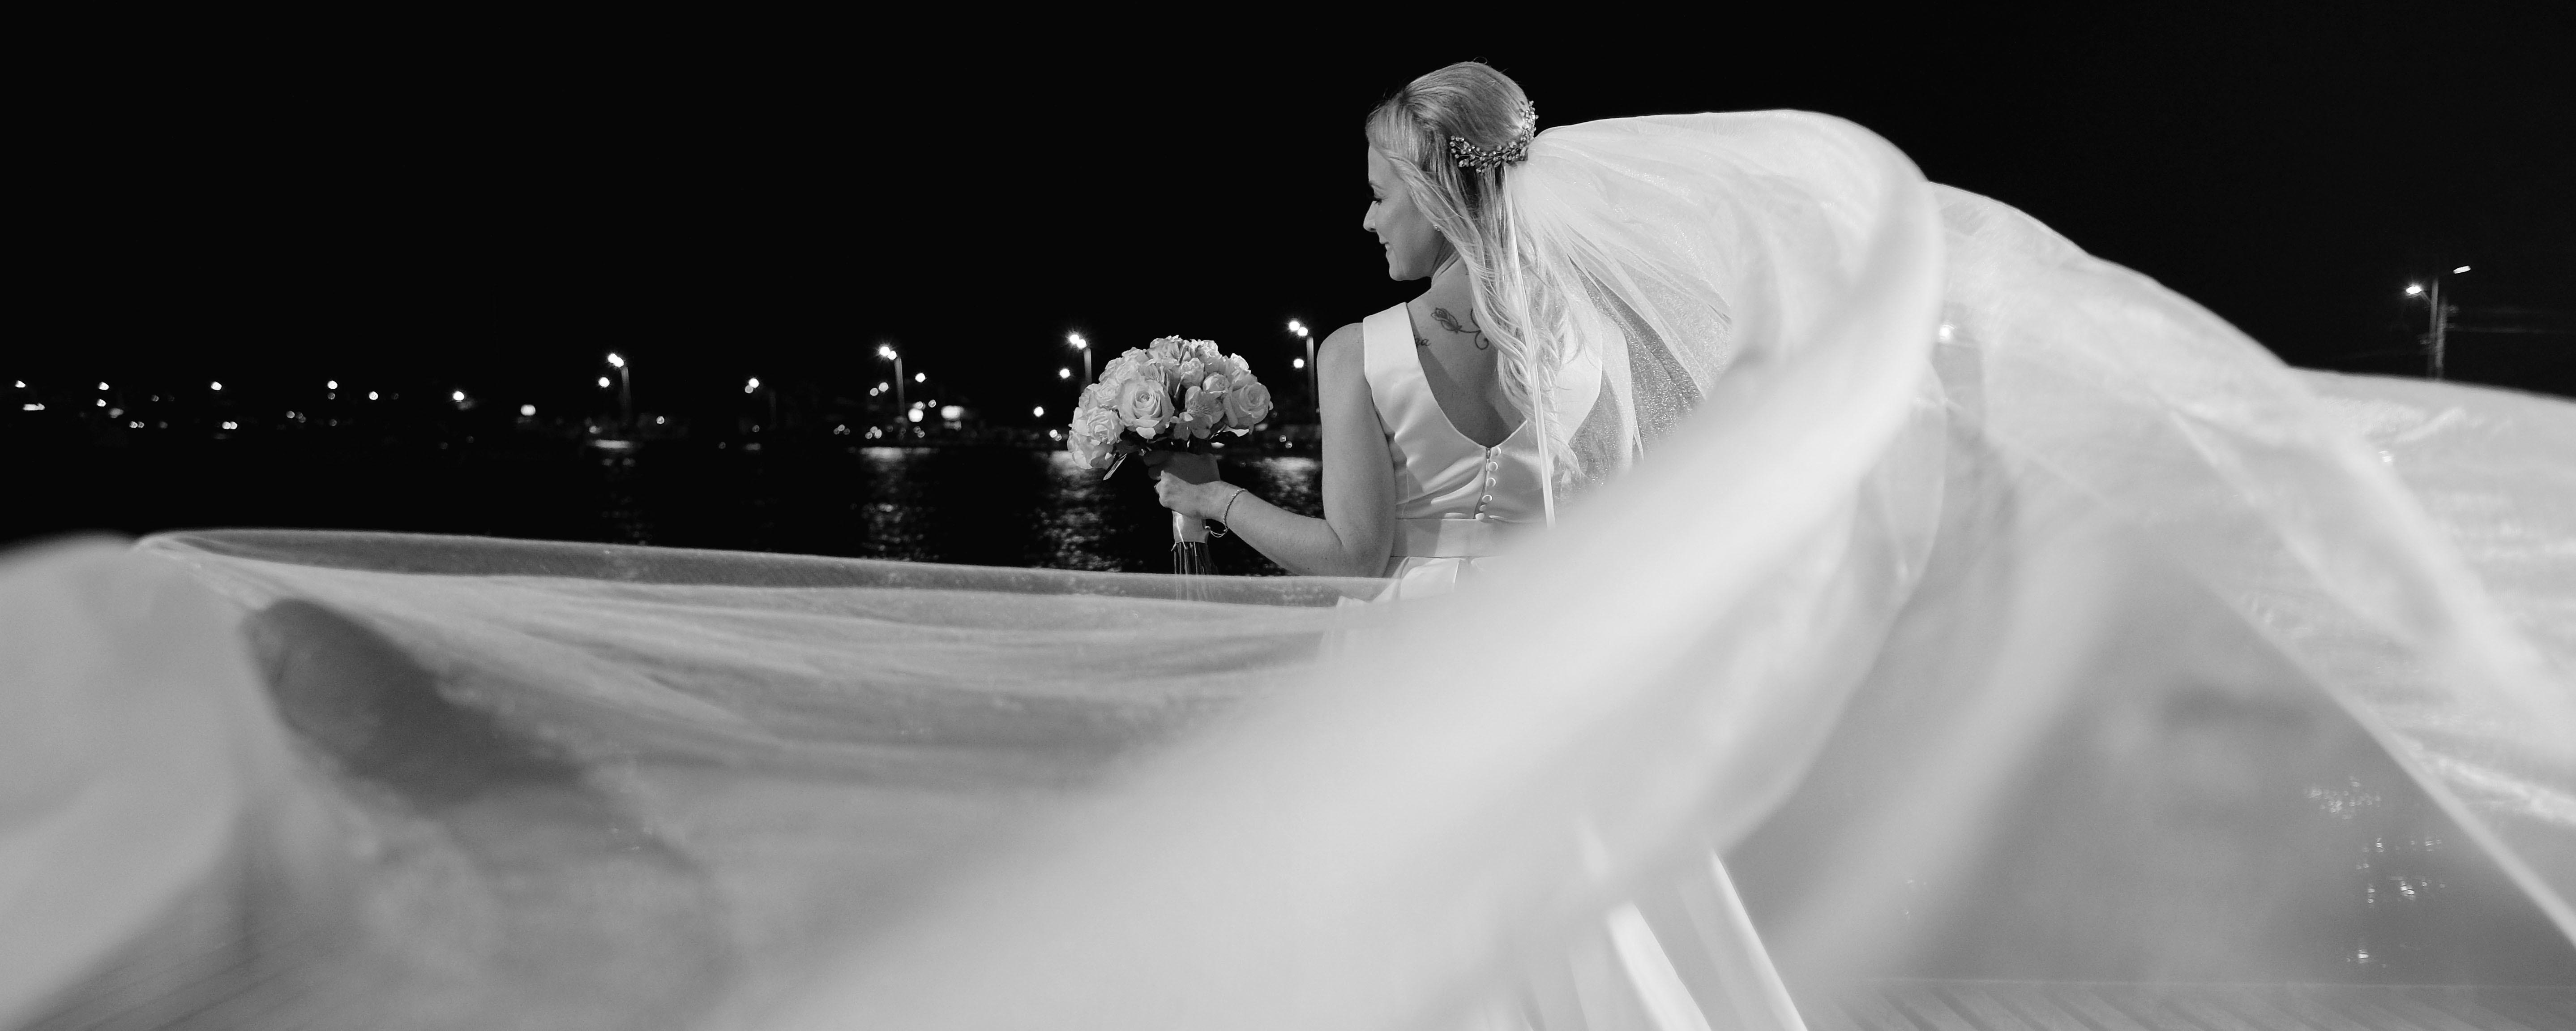 Contate Junior Schmitt - Fotógrafo de casamentos Florianópolis - SC